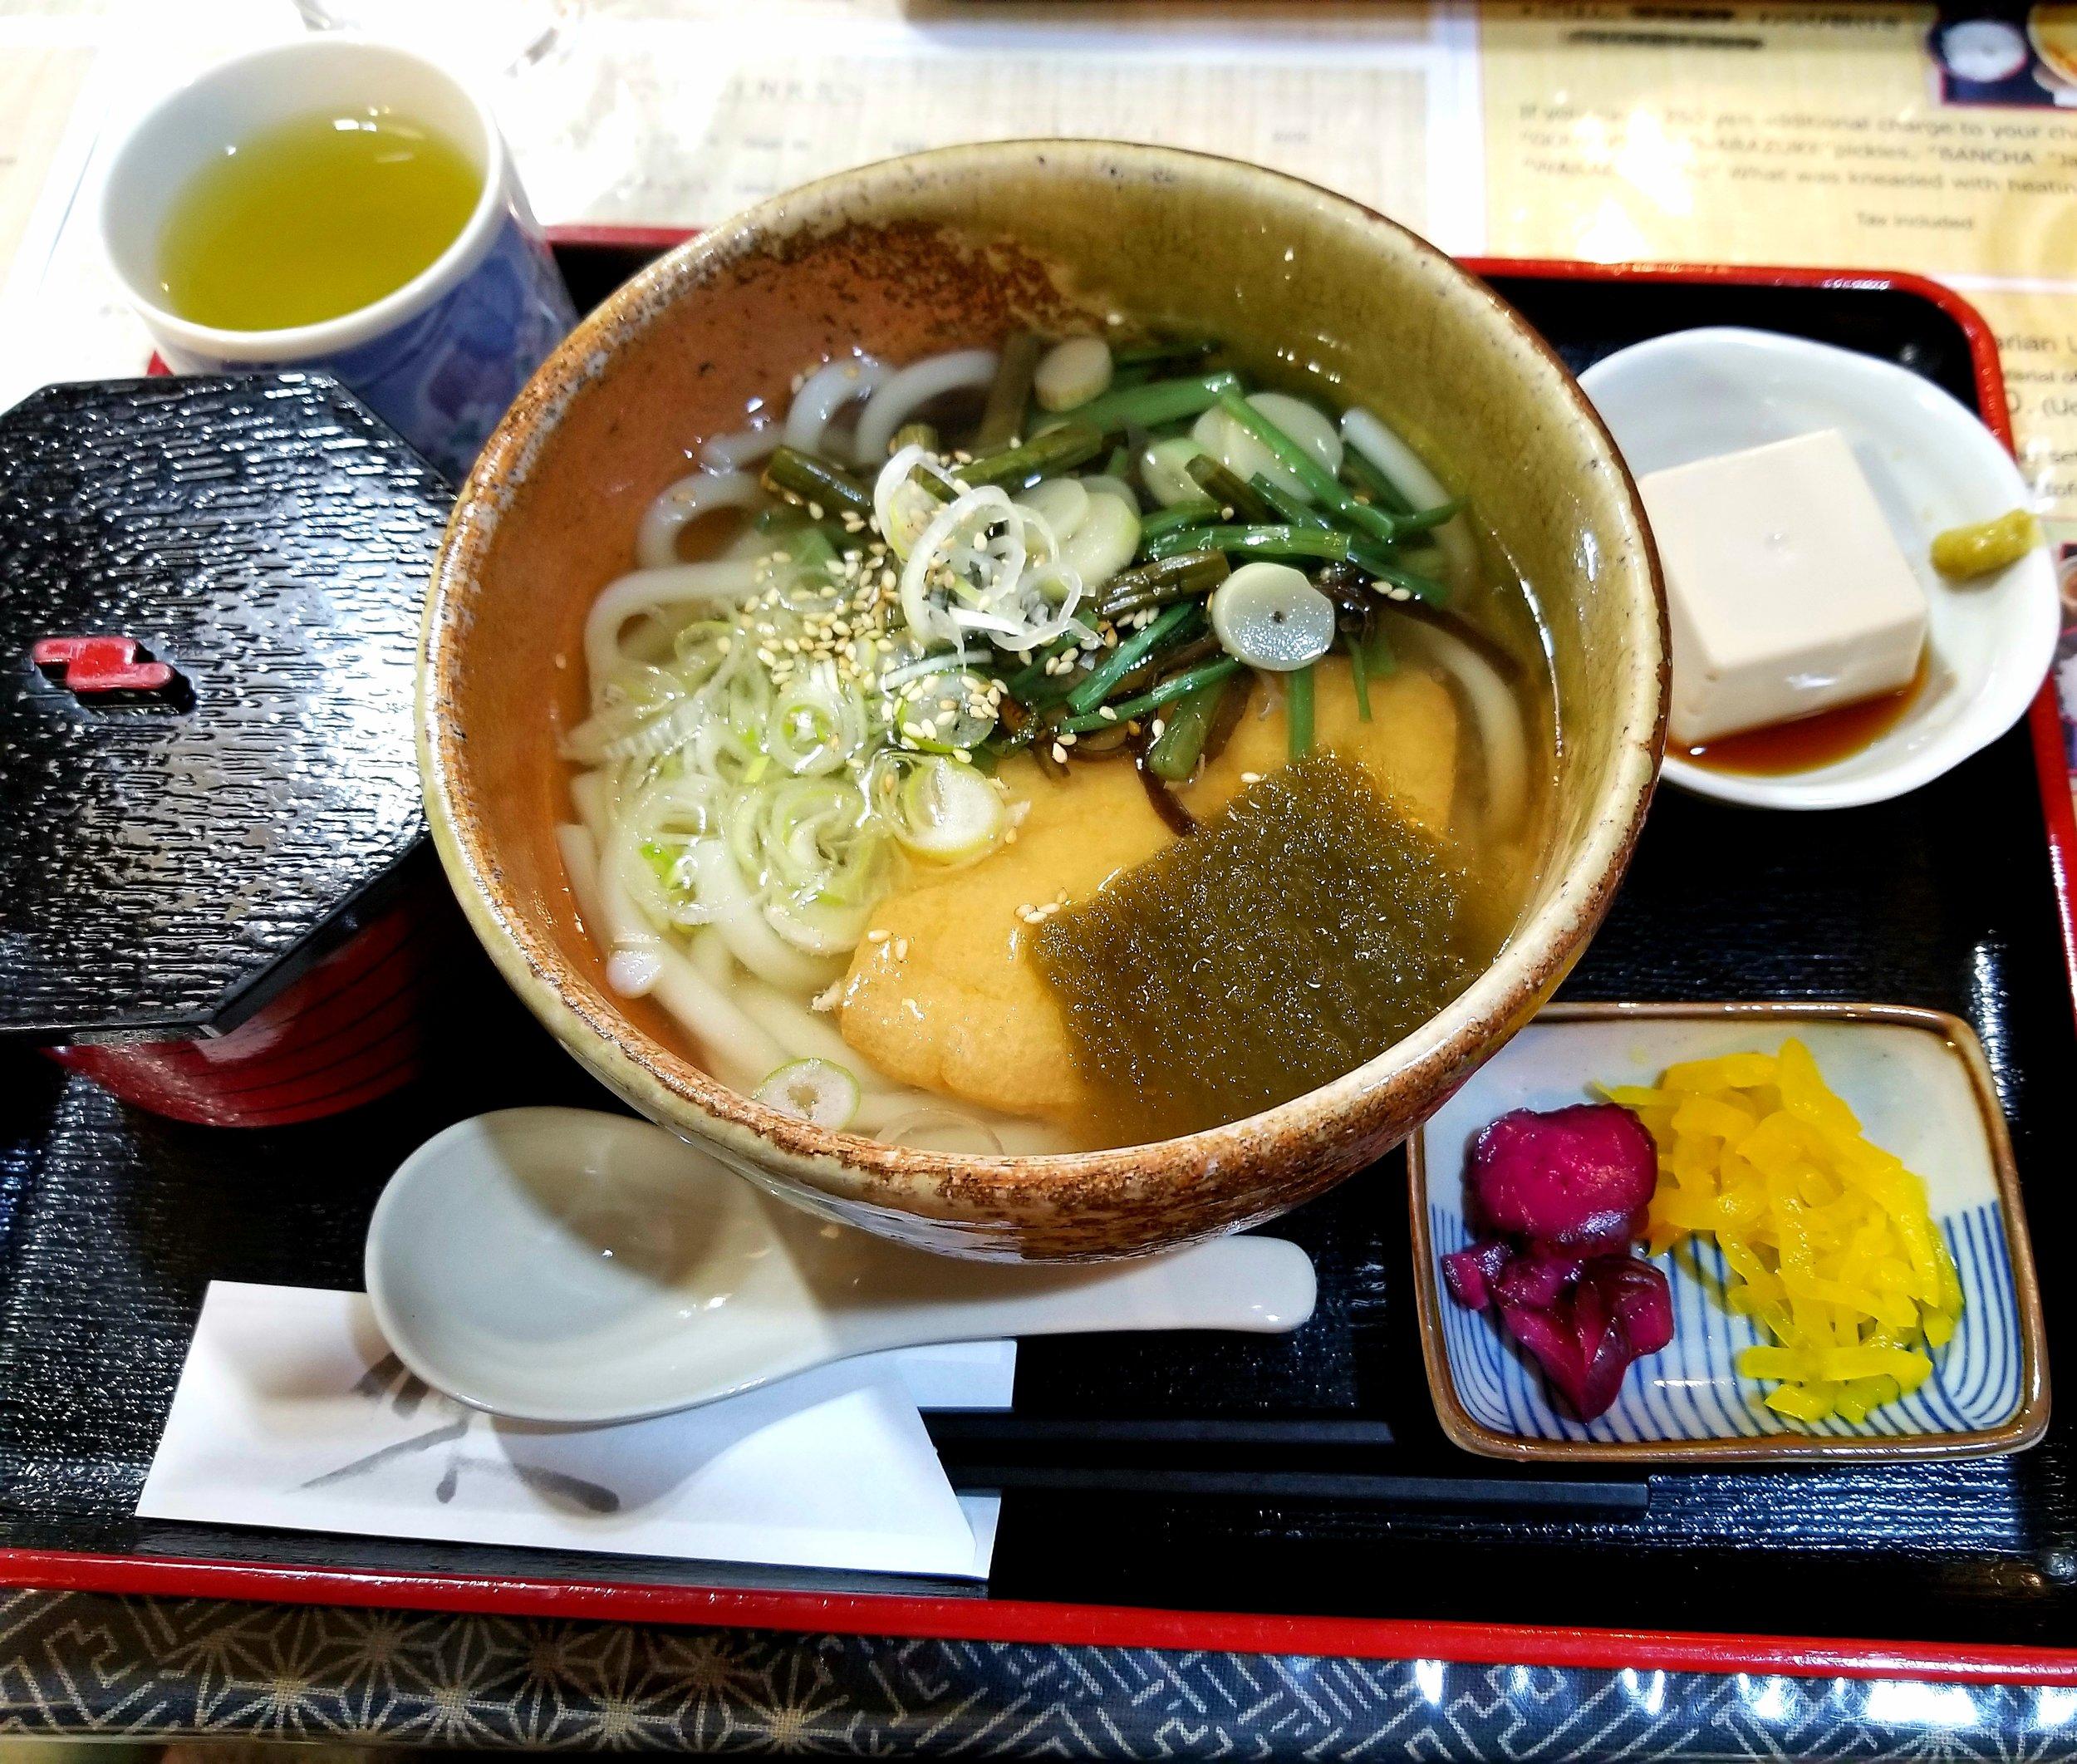 uprooted-traveler-nara-rokumein-udon-vegan-guide-nara